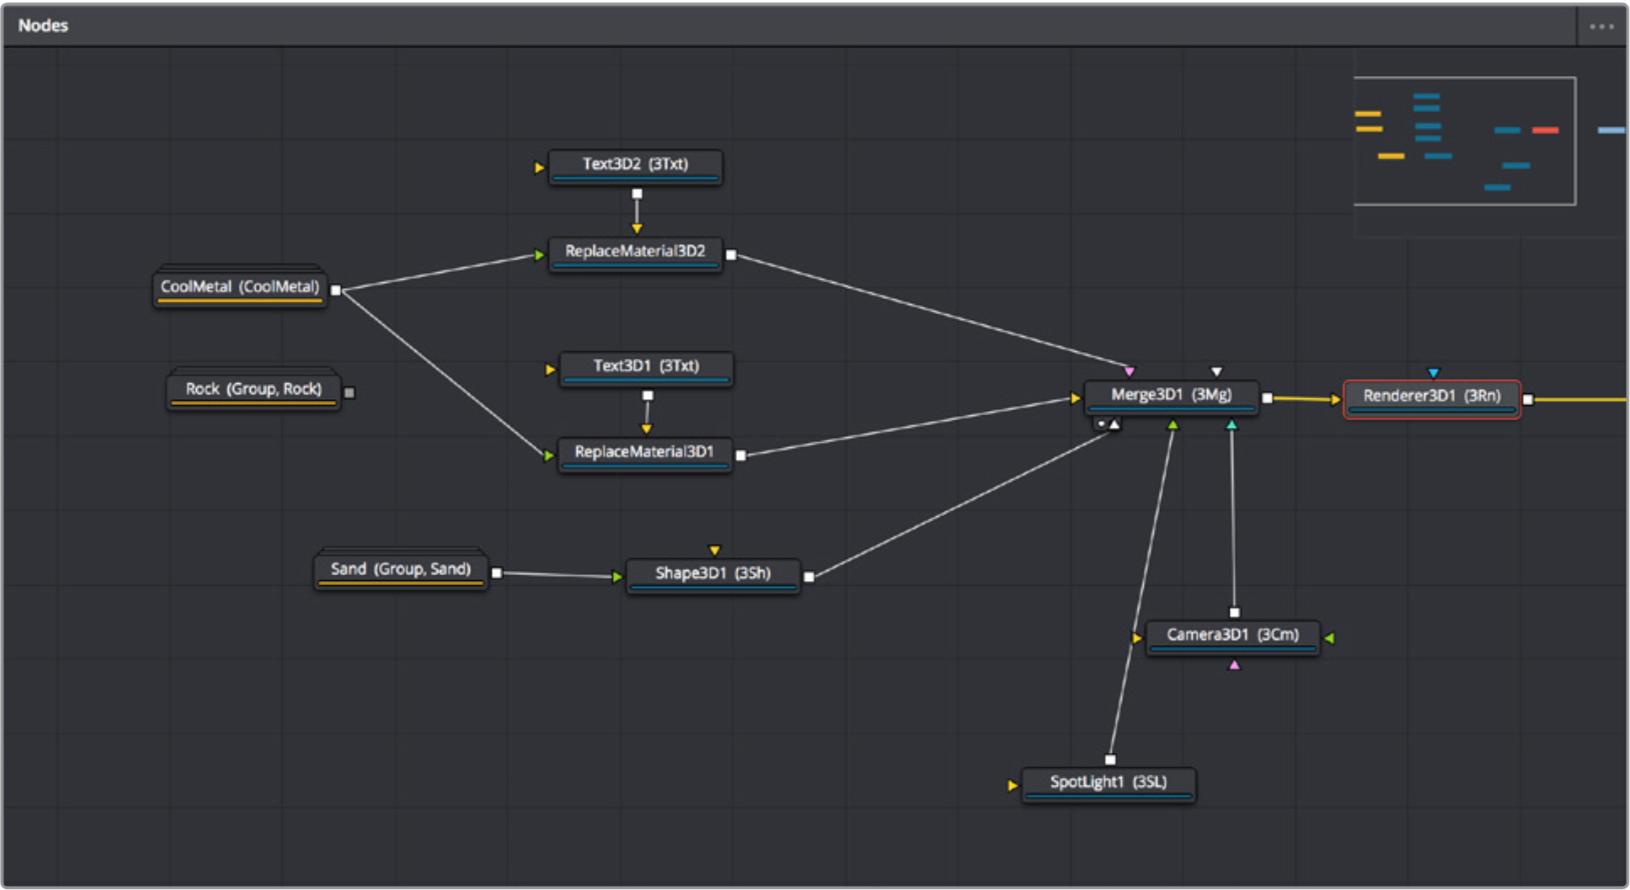 Resolve 15: Blackmagic integrates Fusion into Resolve 21